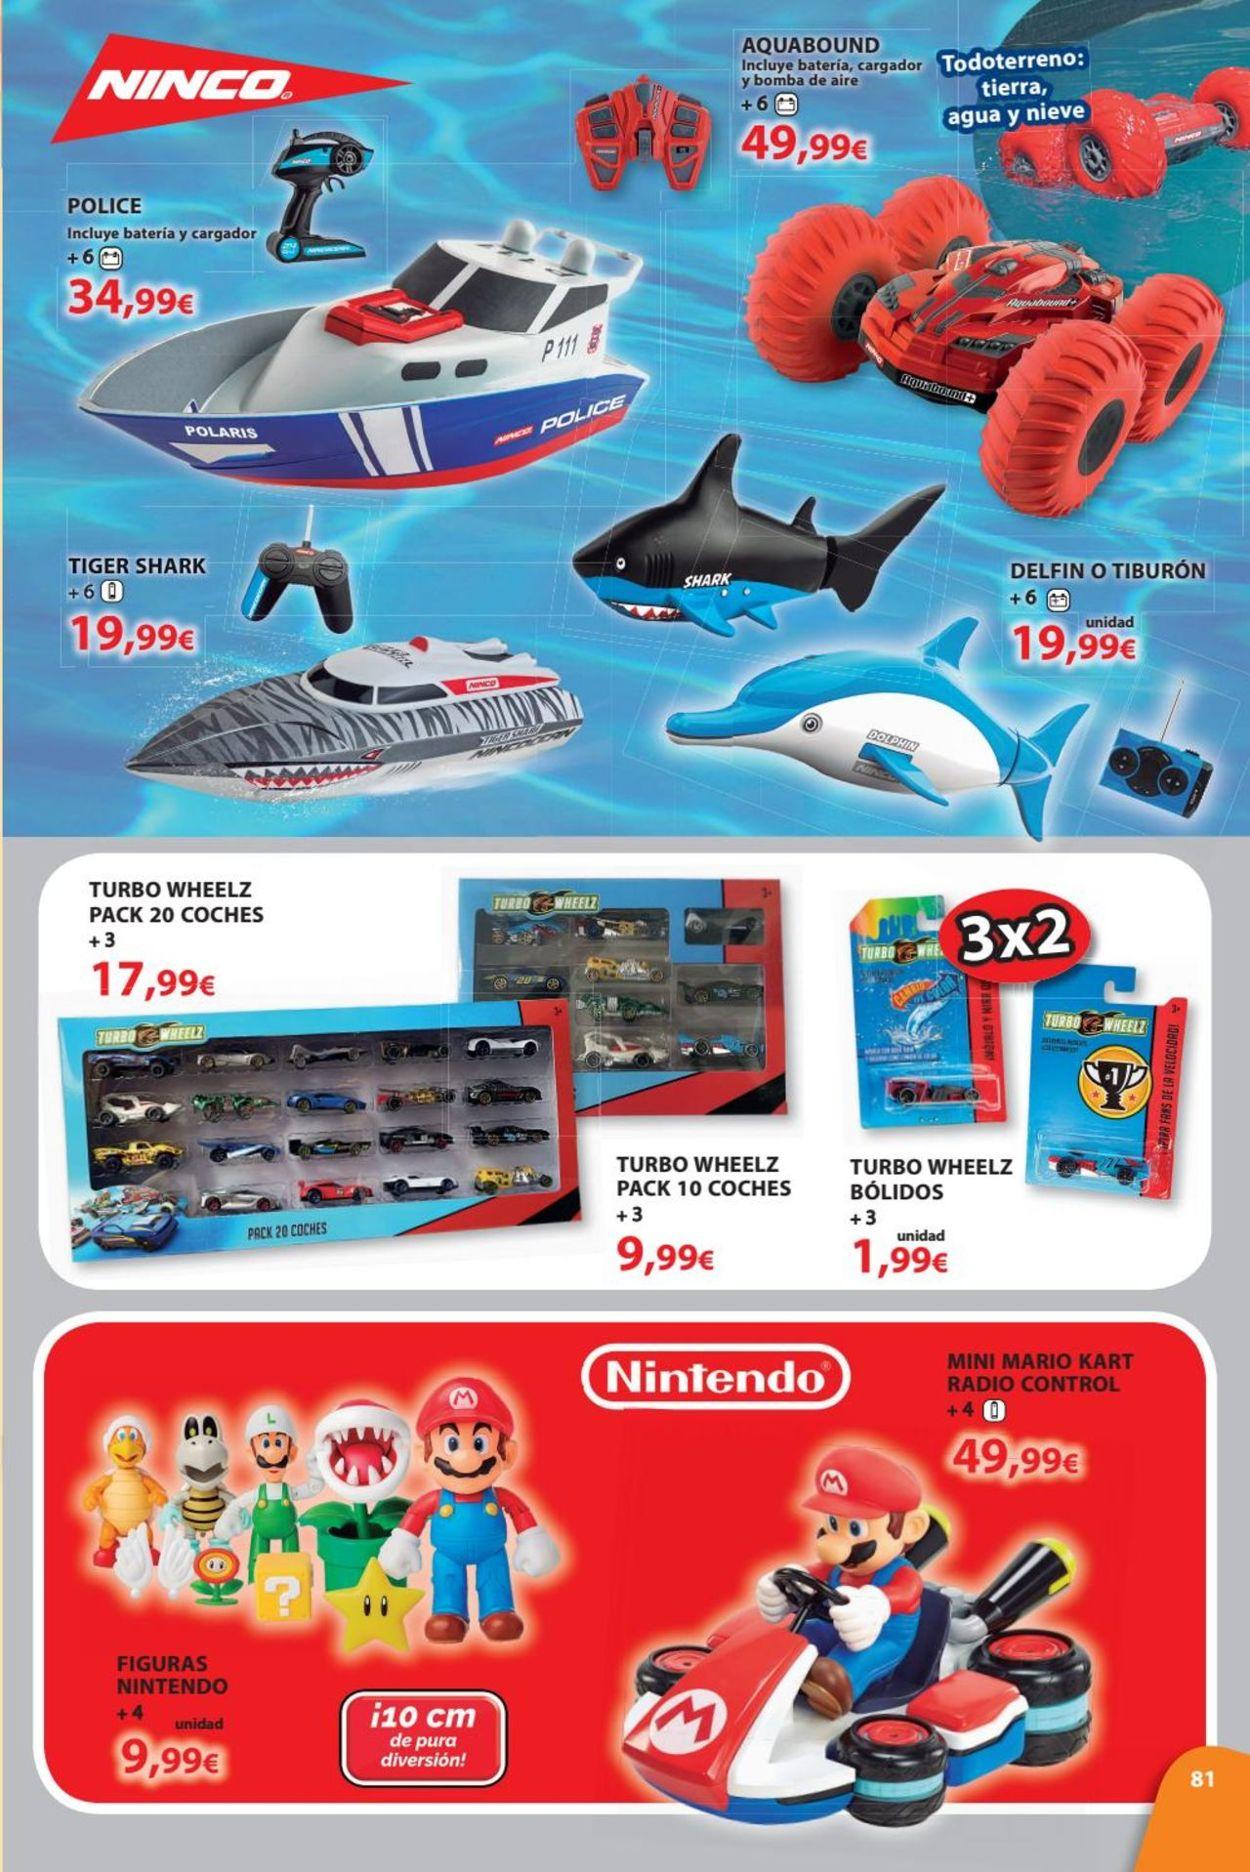 Toy Planet Folleto - 08.06-31.07.2019 (Página 81)